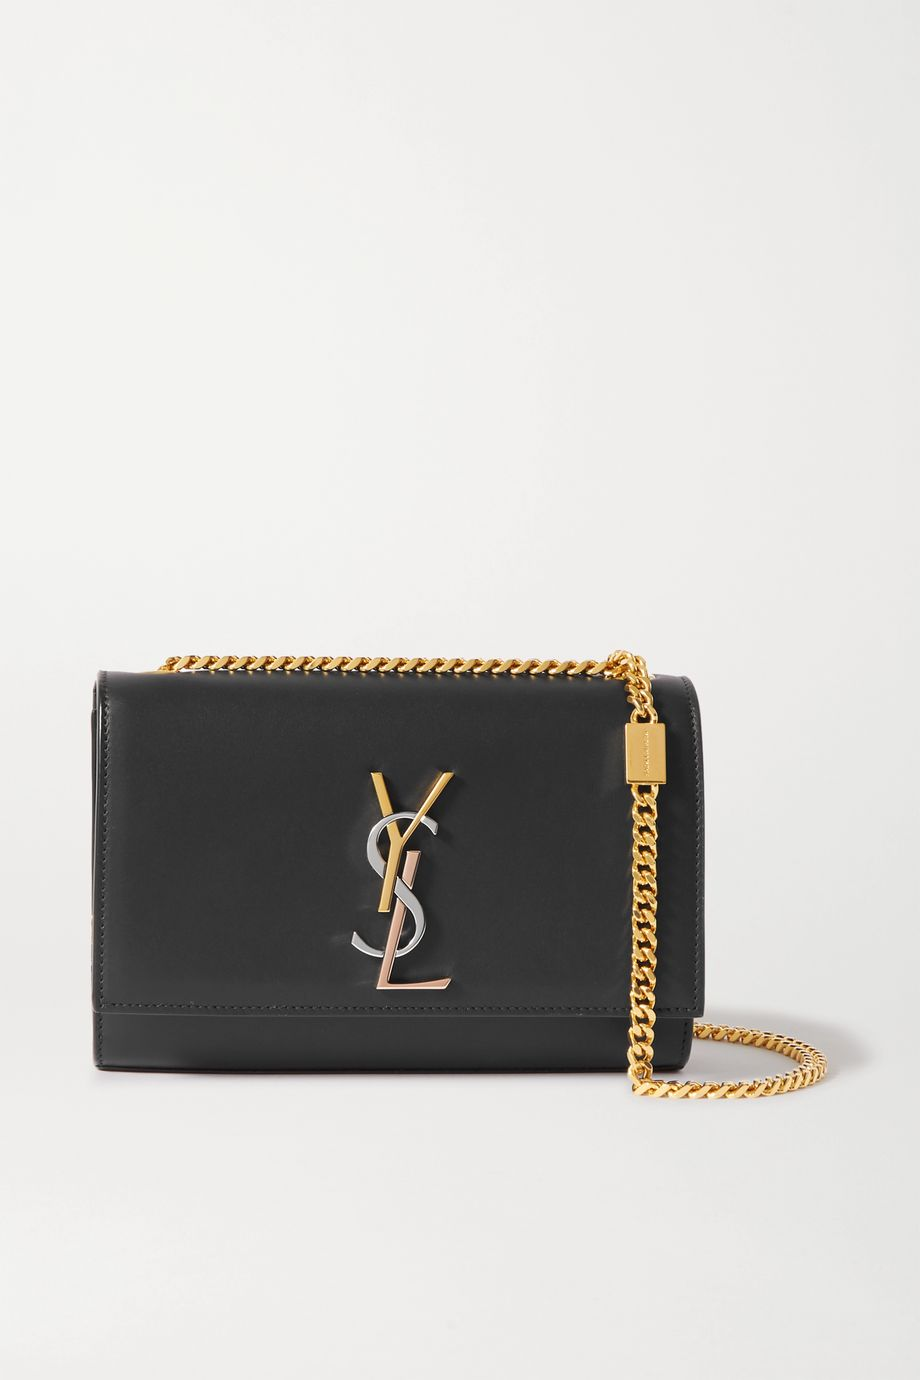 SAINT LAURENT Monogramme Kate small leather shoulder bag